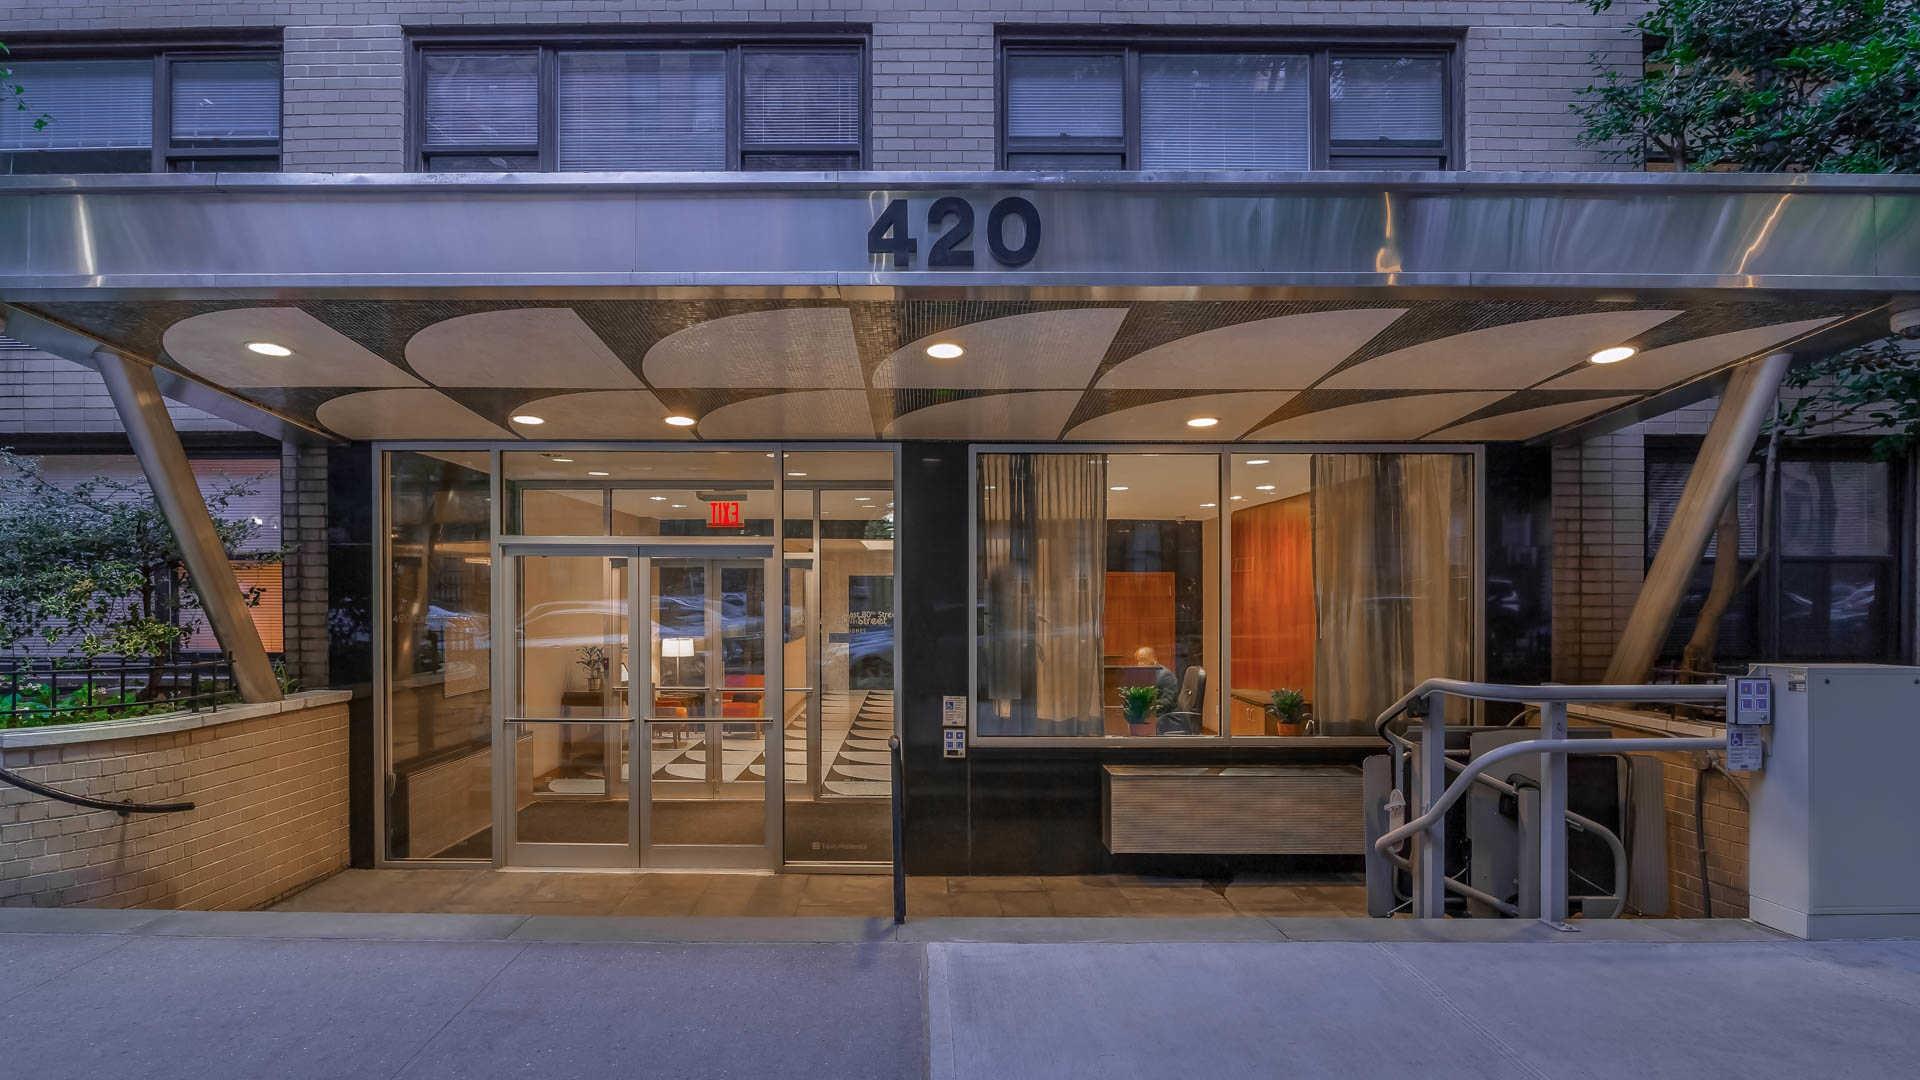 420 East 80th Street